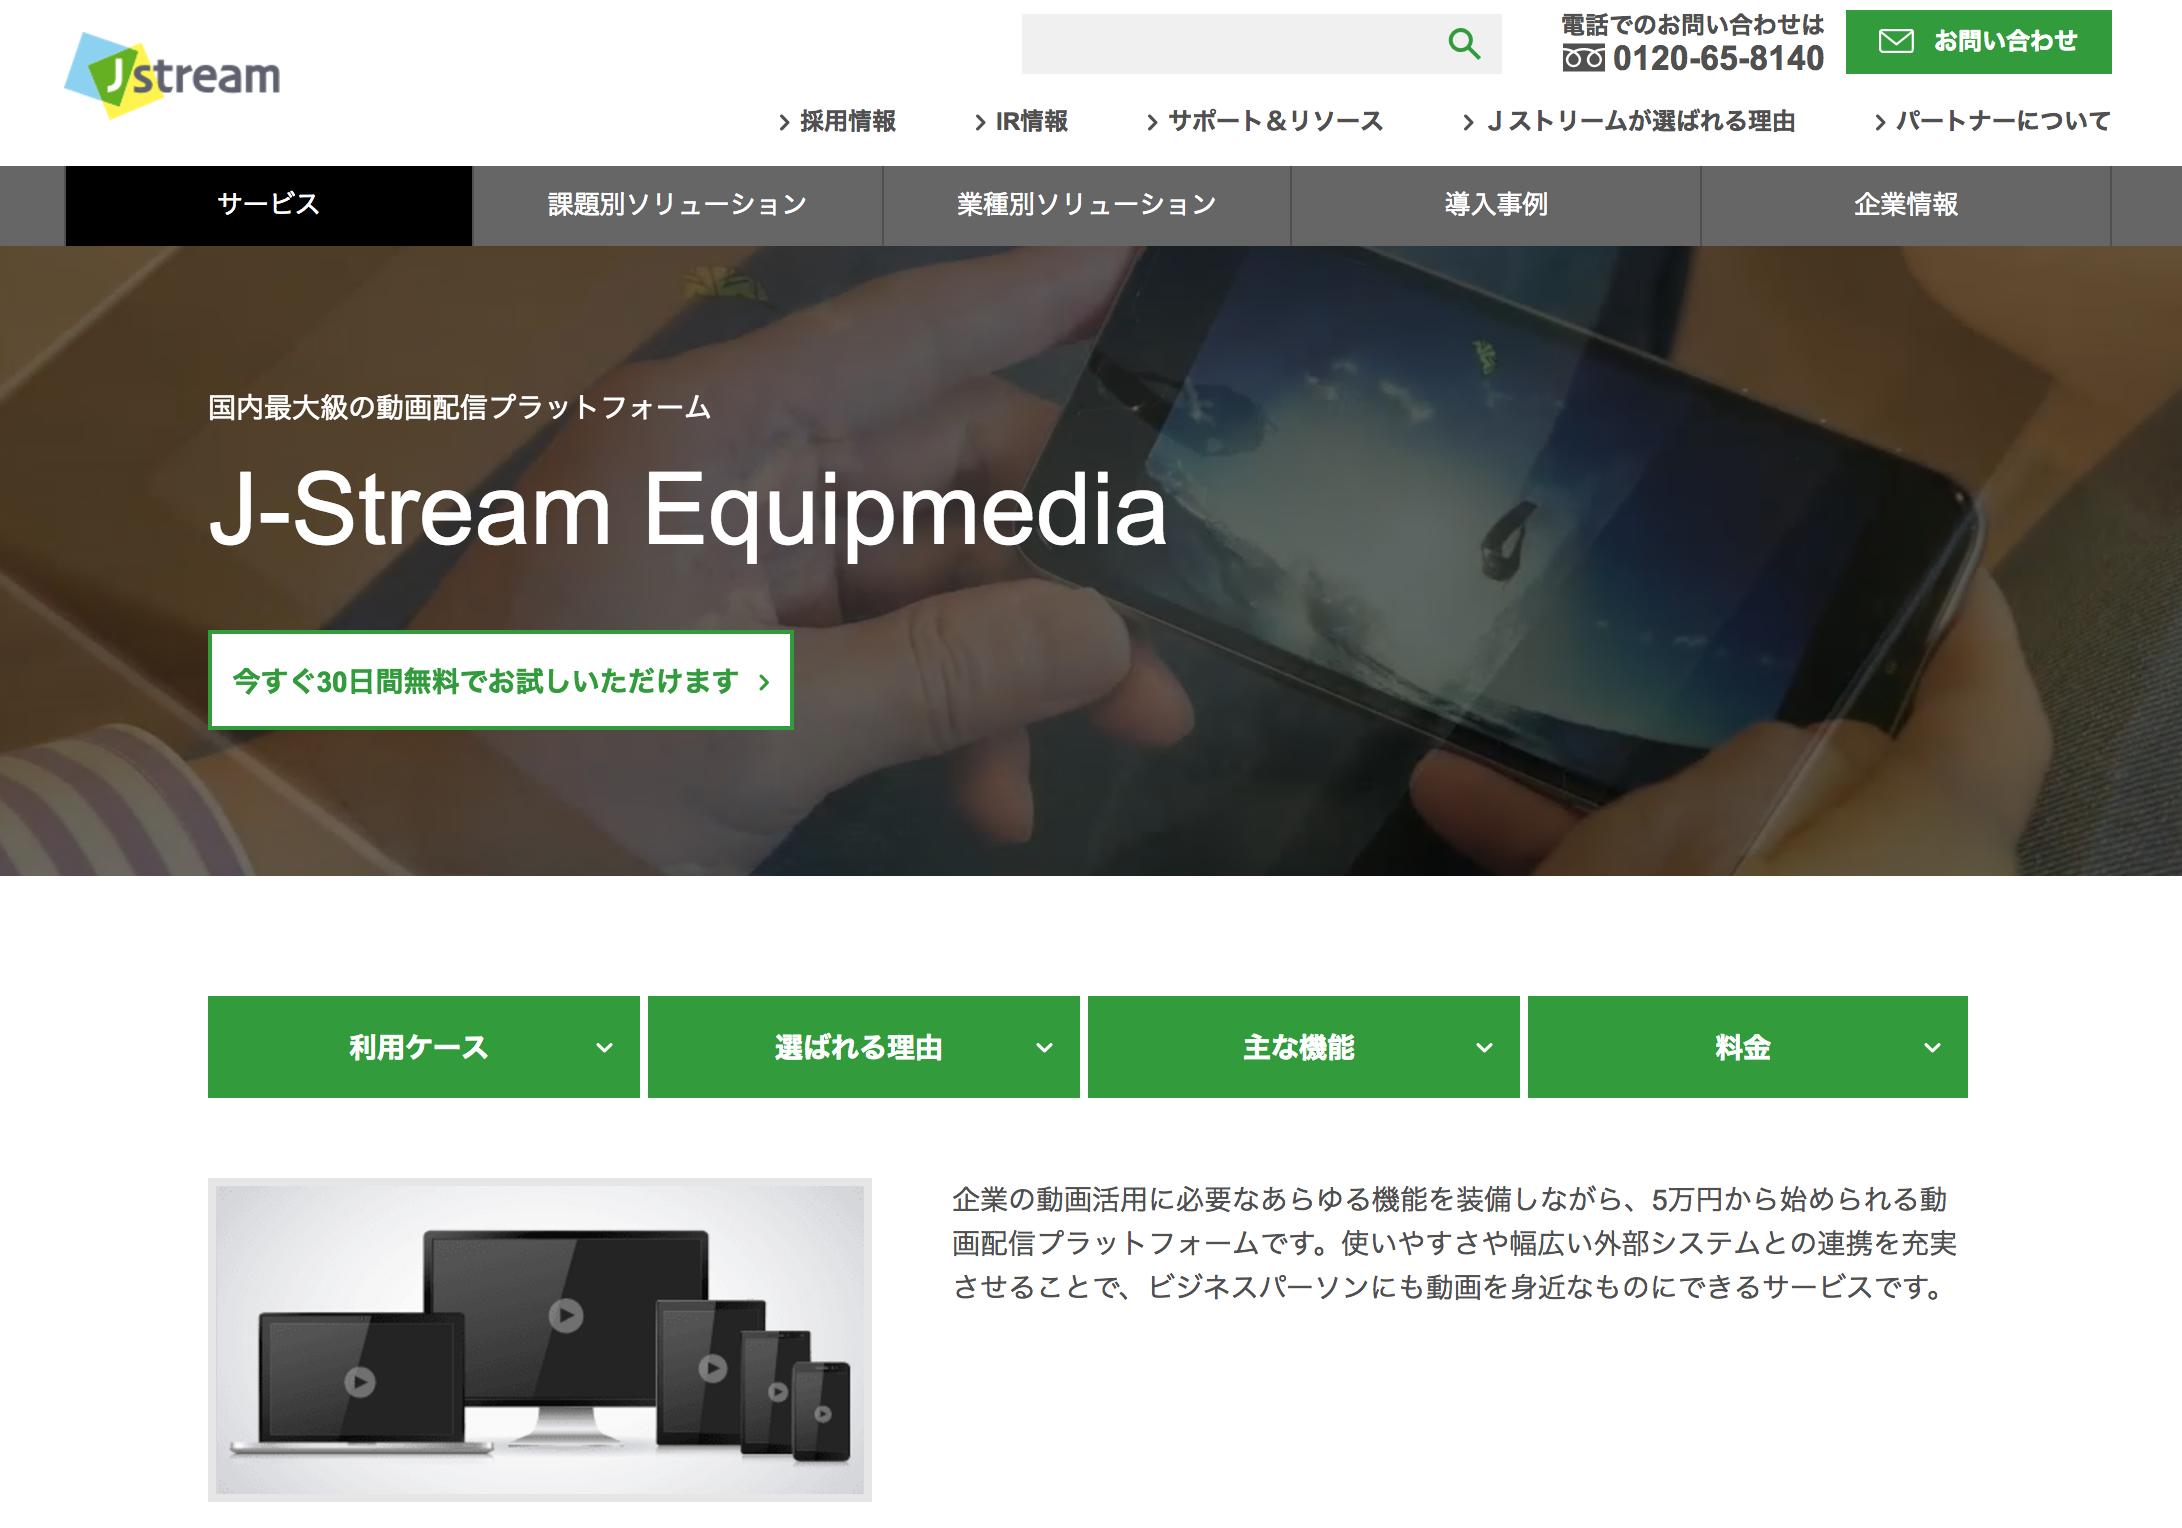 J-Stream Equipmedia : Jストリーム